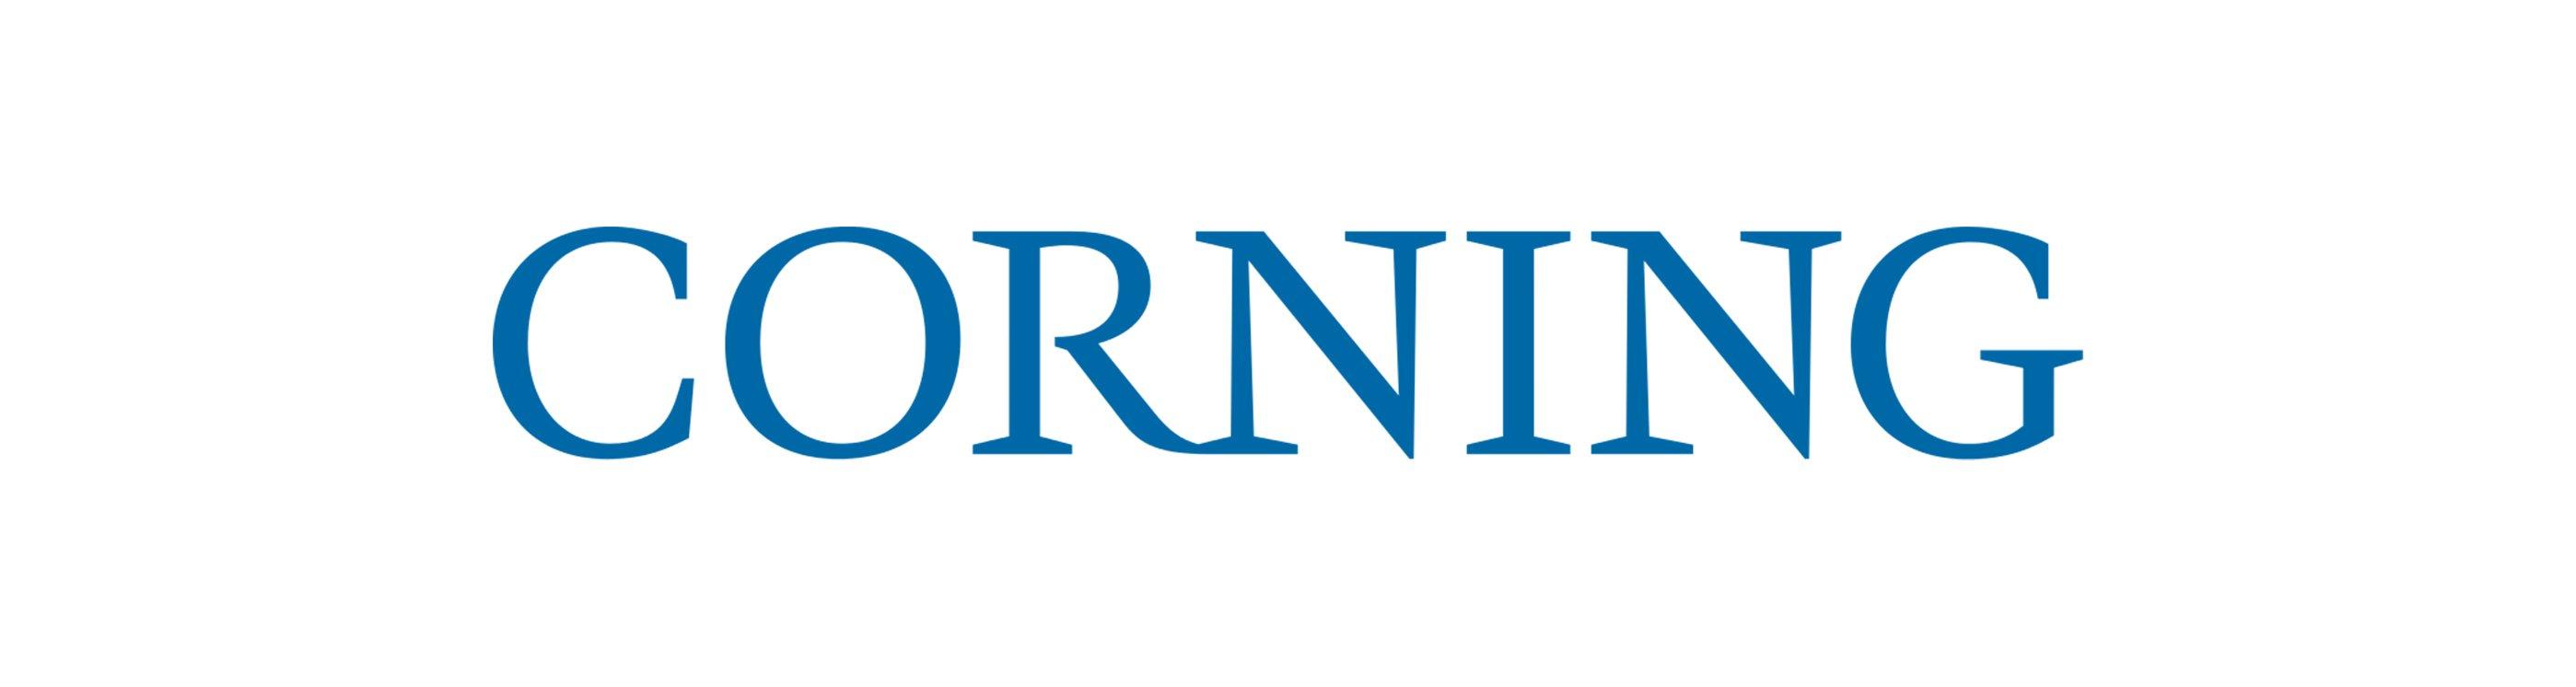 C (logo) (blog image)